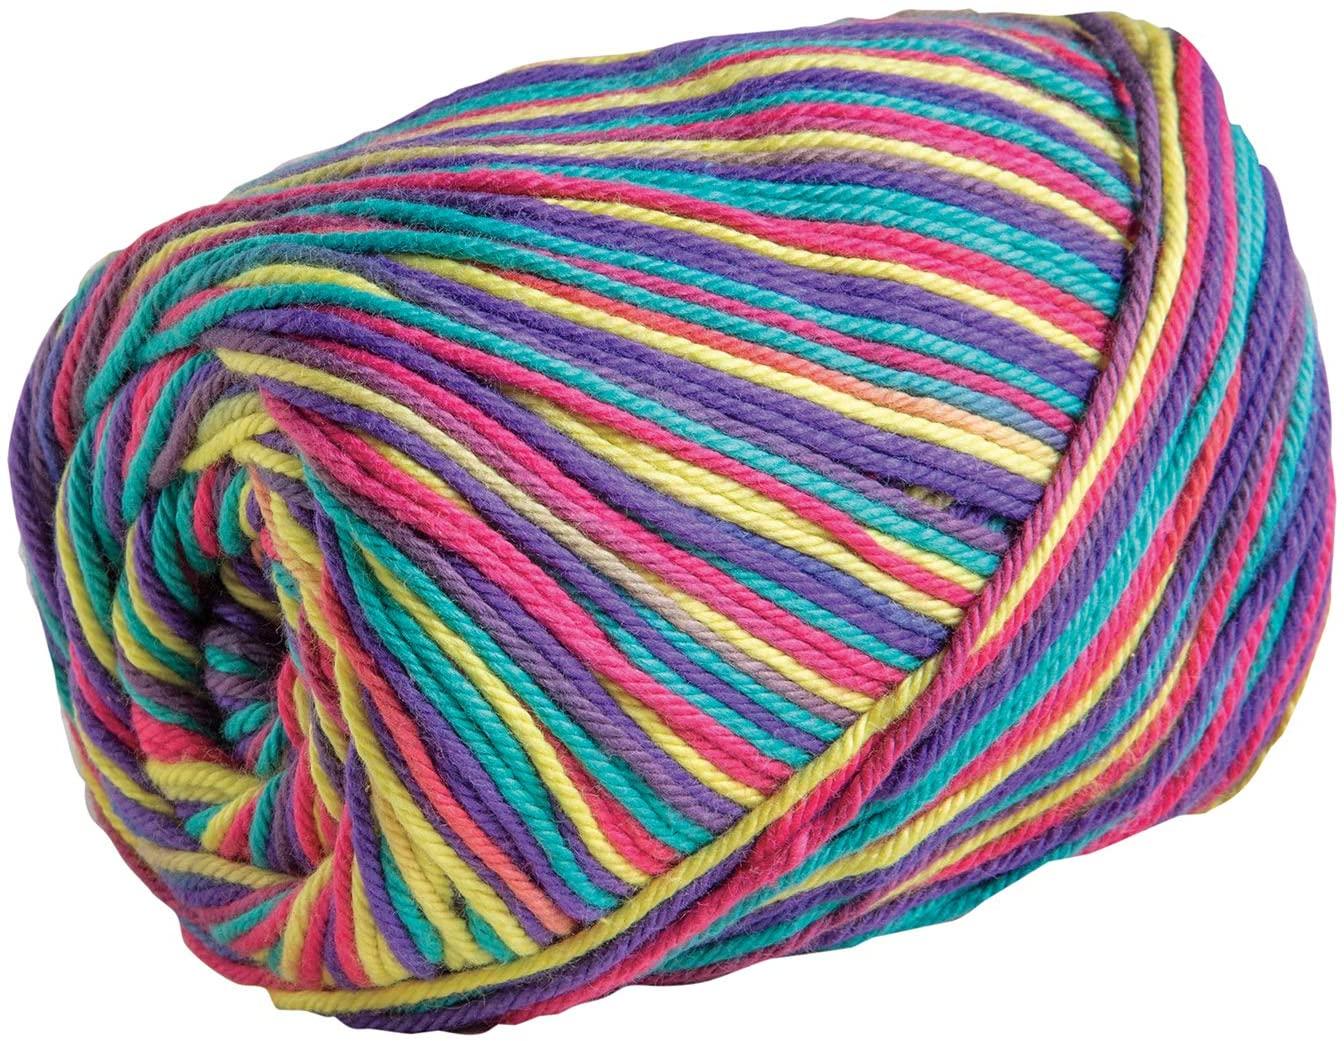 Knit Picks Dishie Multi Worsted Weight 100% Cotton Yarn - 100 g (Summer Jams)